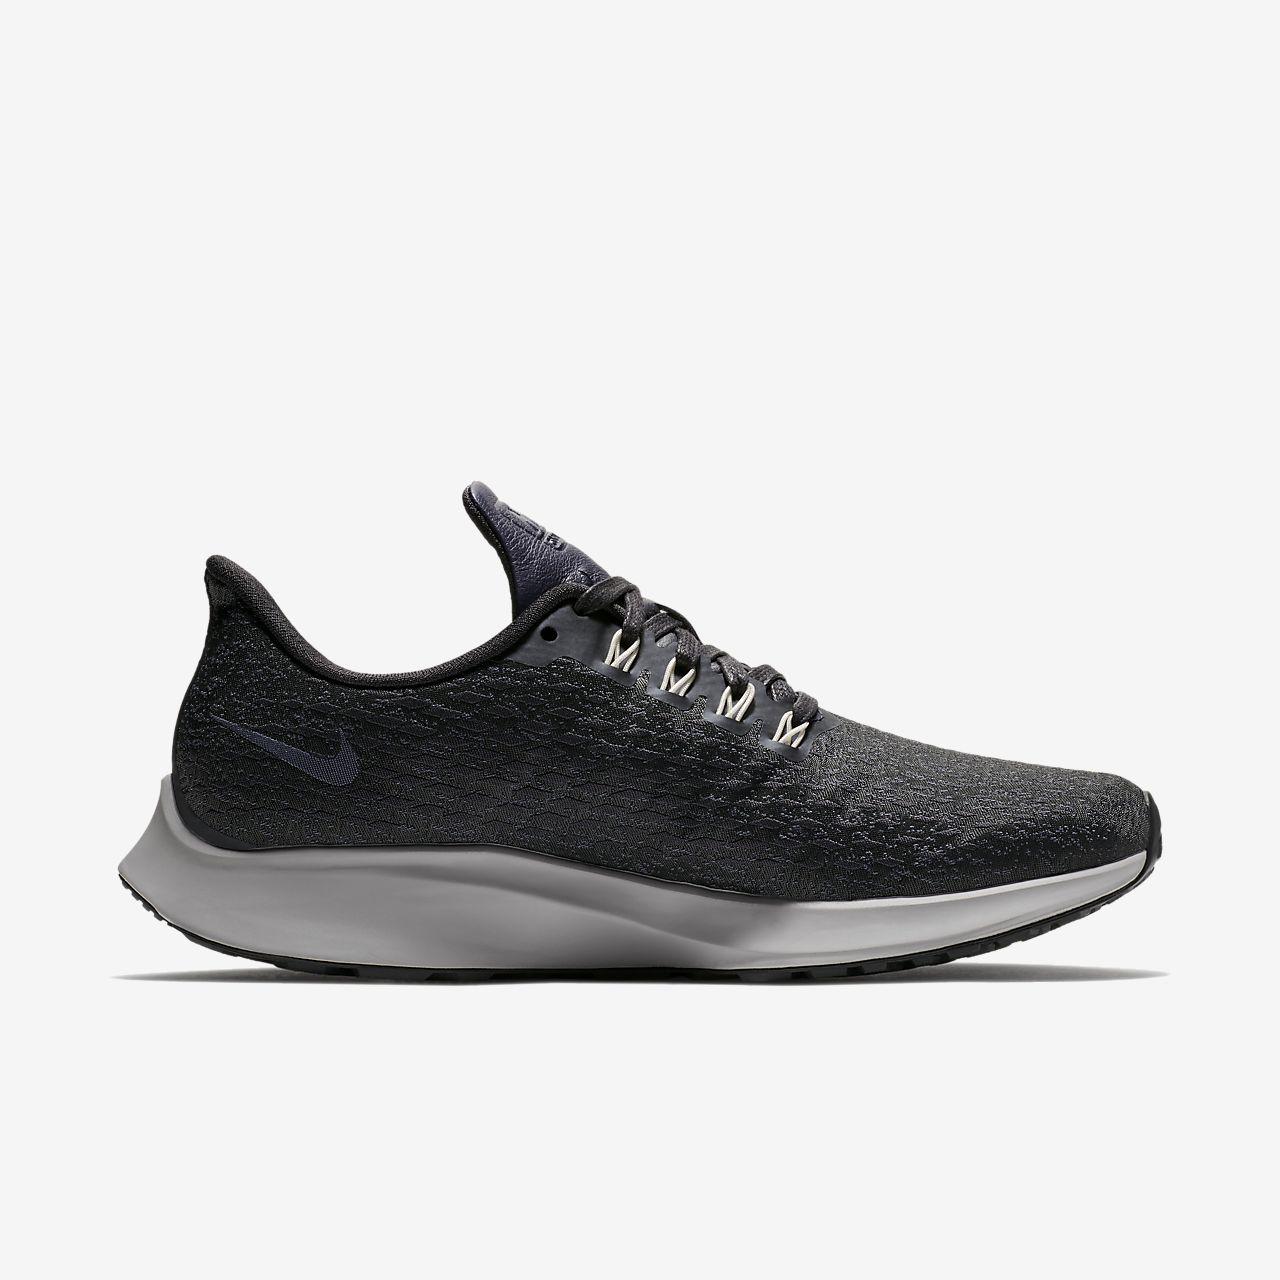 683b5eed500 Nike Air Zoom Pegasus 35 Premium Women s Running Shoe. Nike.com CH